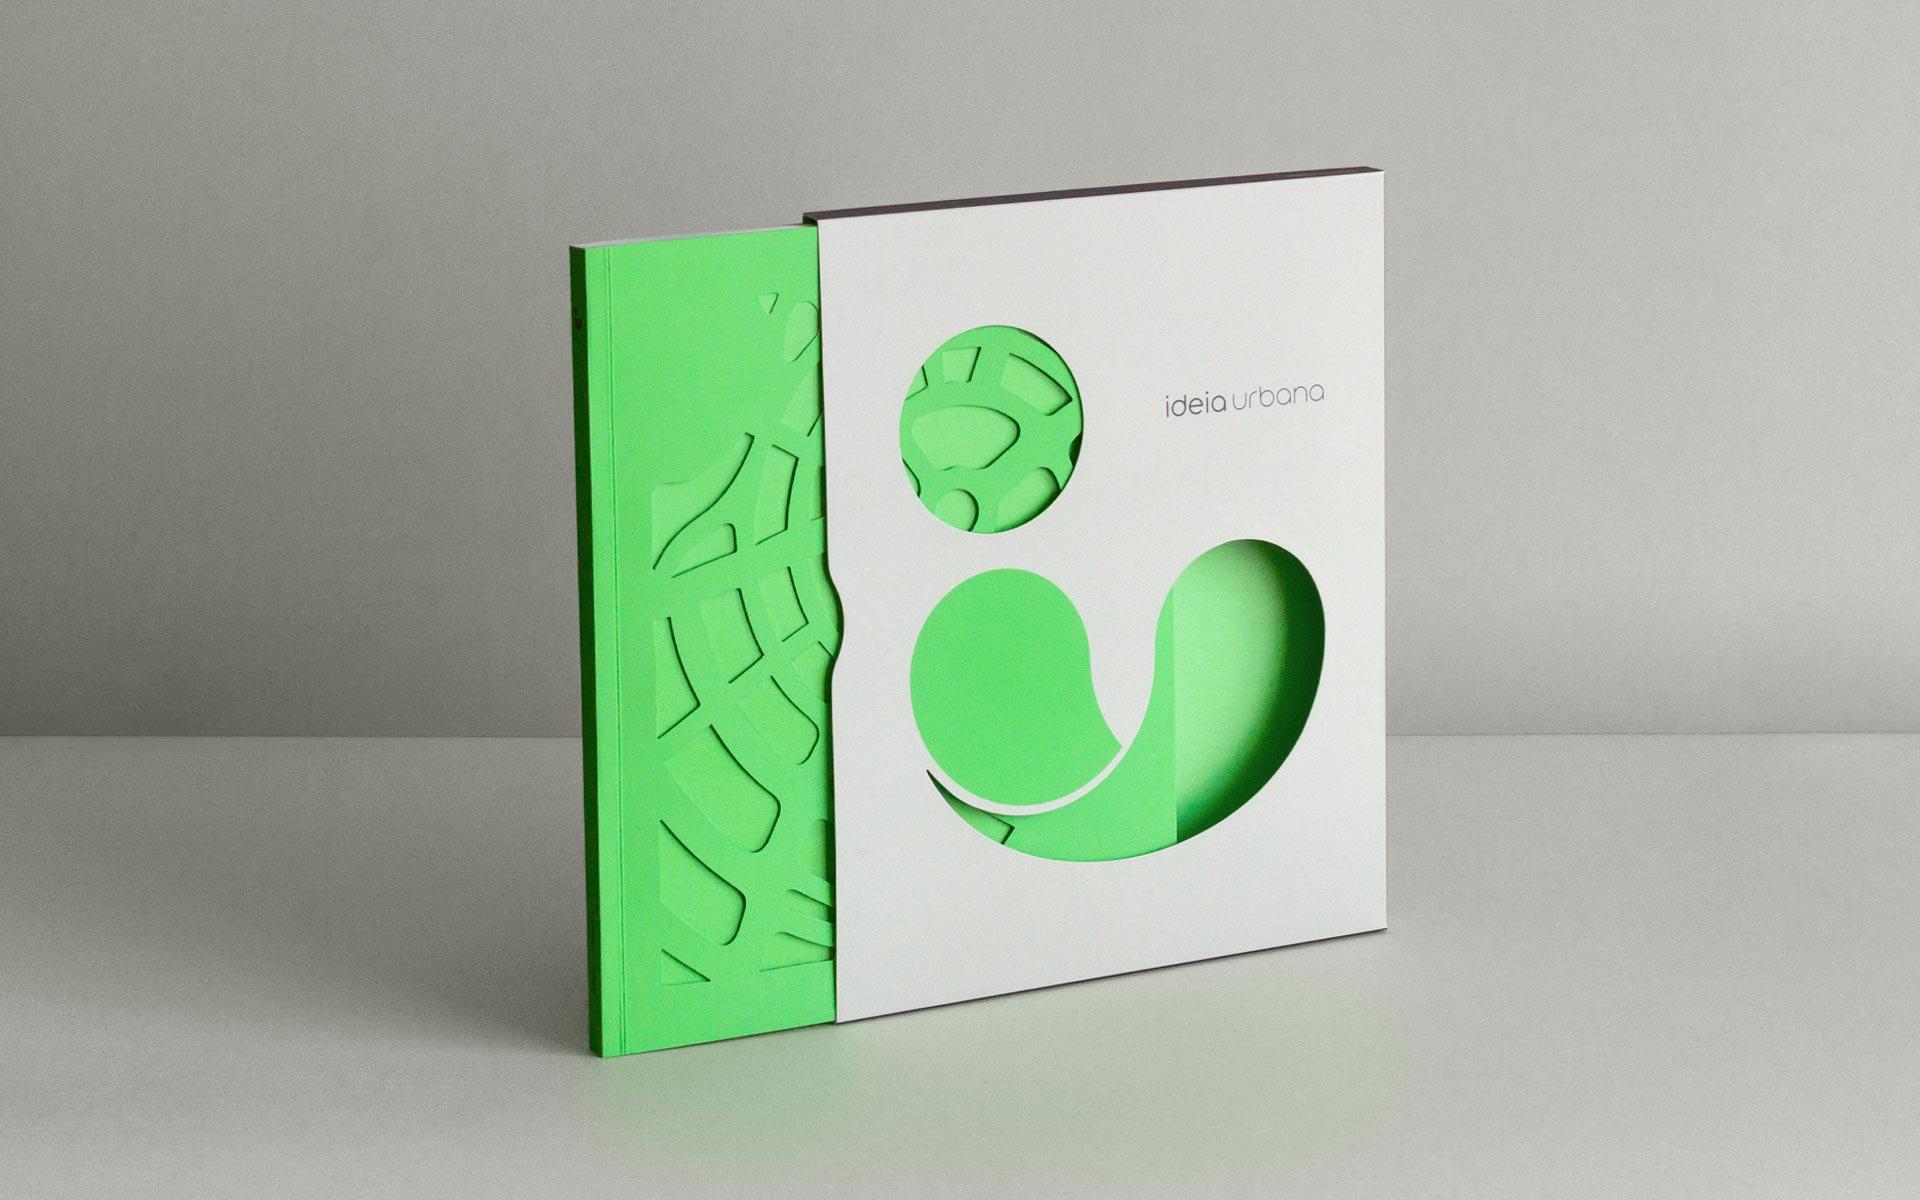 Ideia Urbana rebranding and portfolio book - Fonts In Use